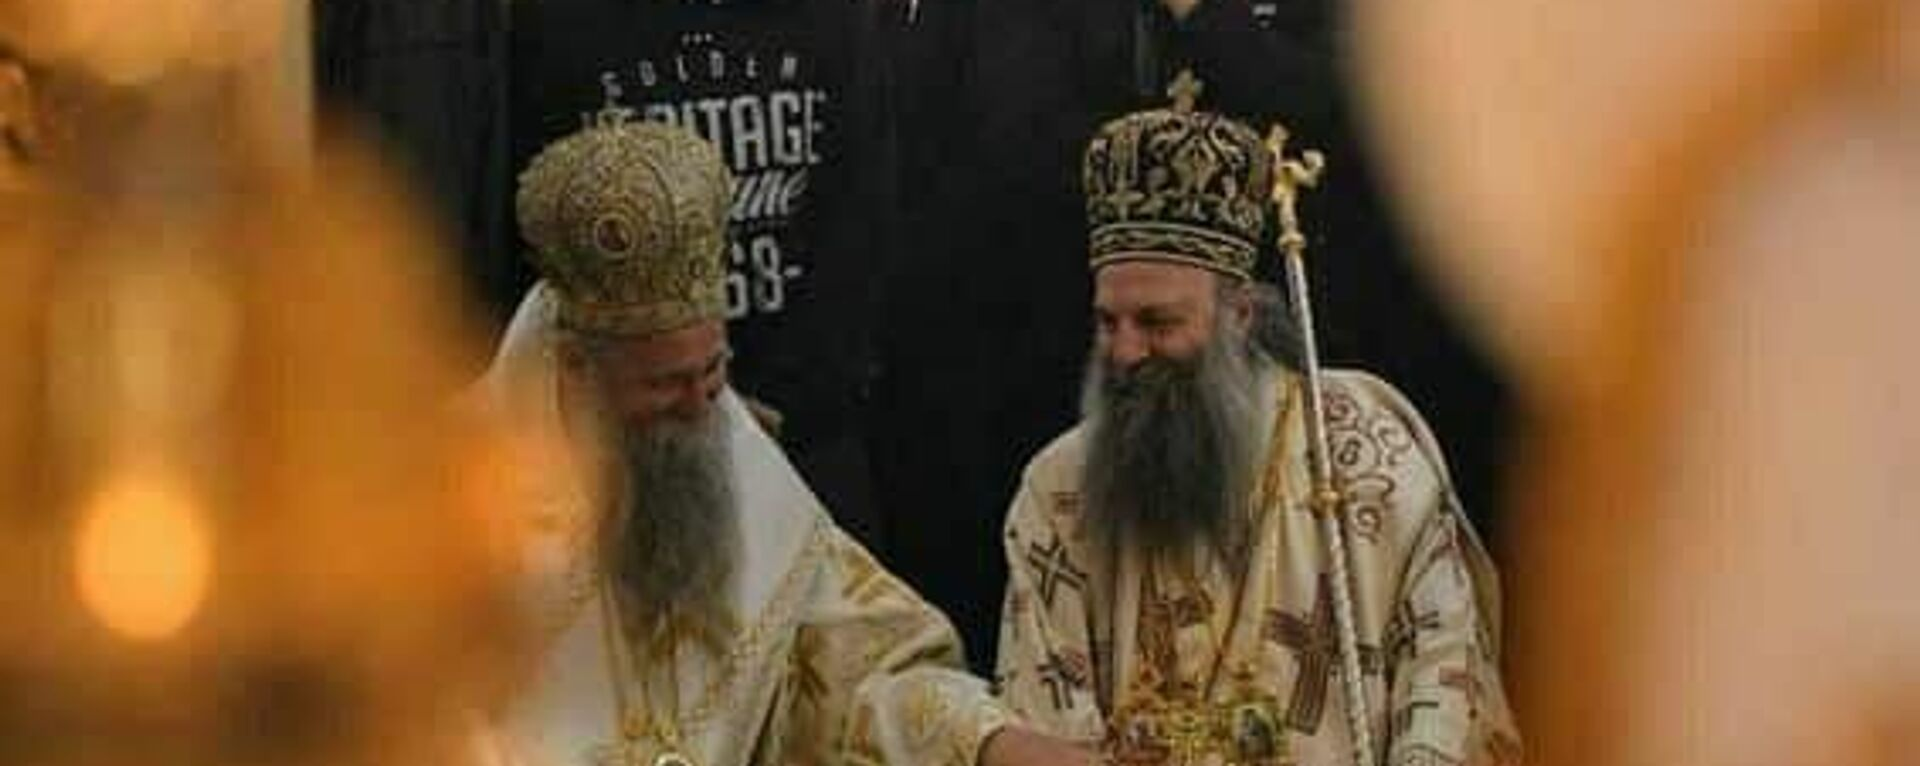 Mitropolit crnogorsko-primorski Joanikije i patrijarh srpski Porfirije u cetinjskom manastiru - Sputnik Srbija, 1920, 05.09.2021